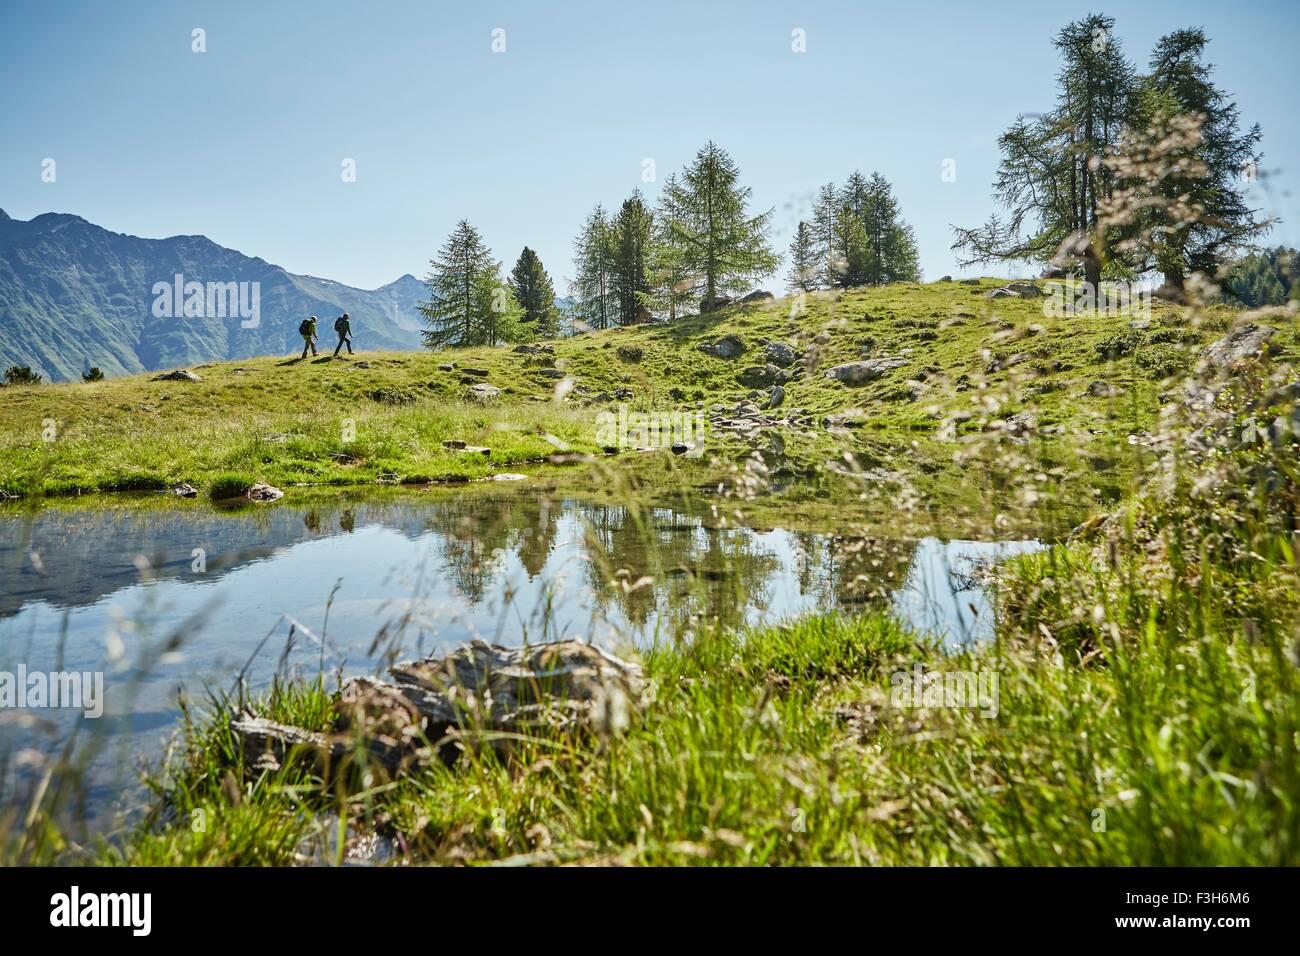 Junge Paar in fernen Wandern Landschaft, Karthaus, Val Senales, Südtirol, Italien Stockbild